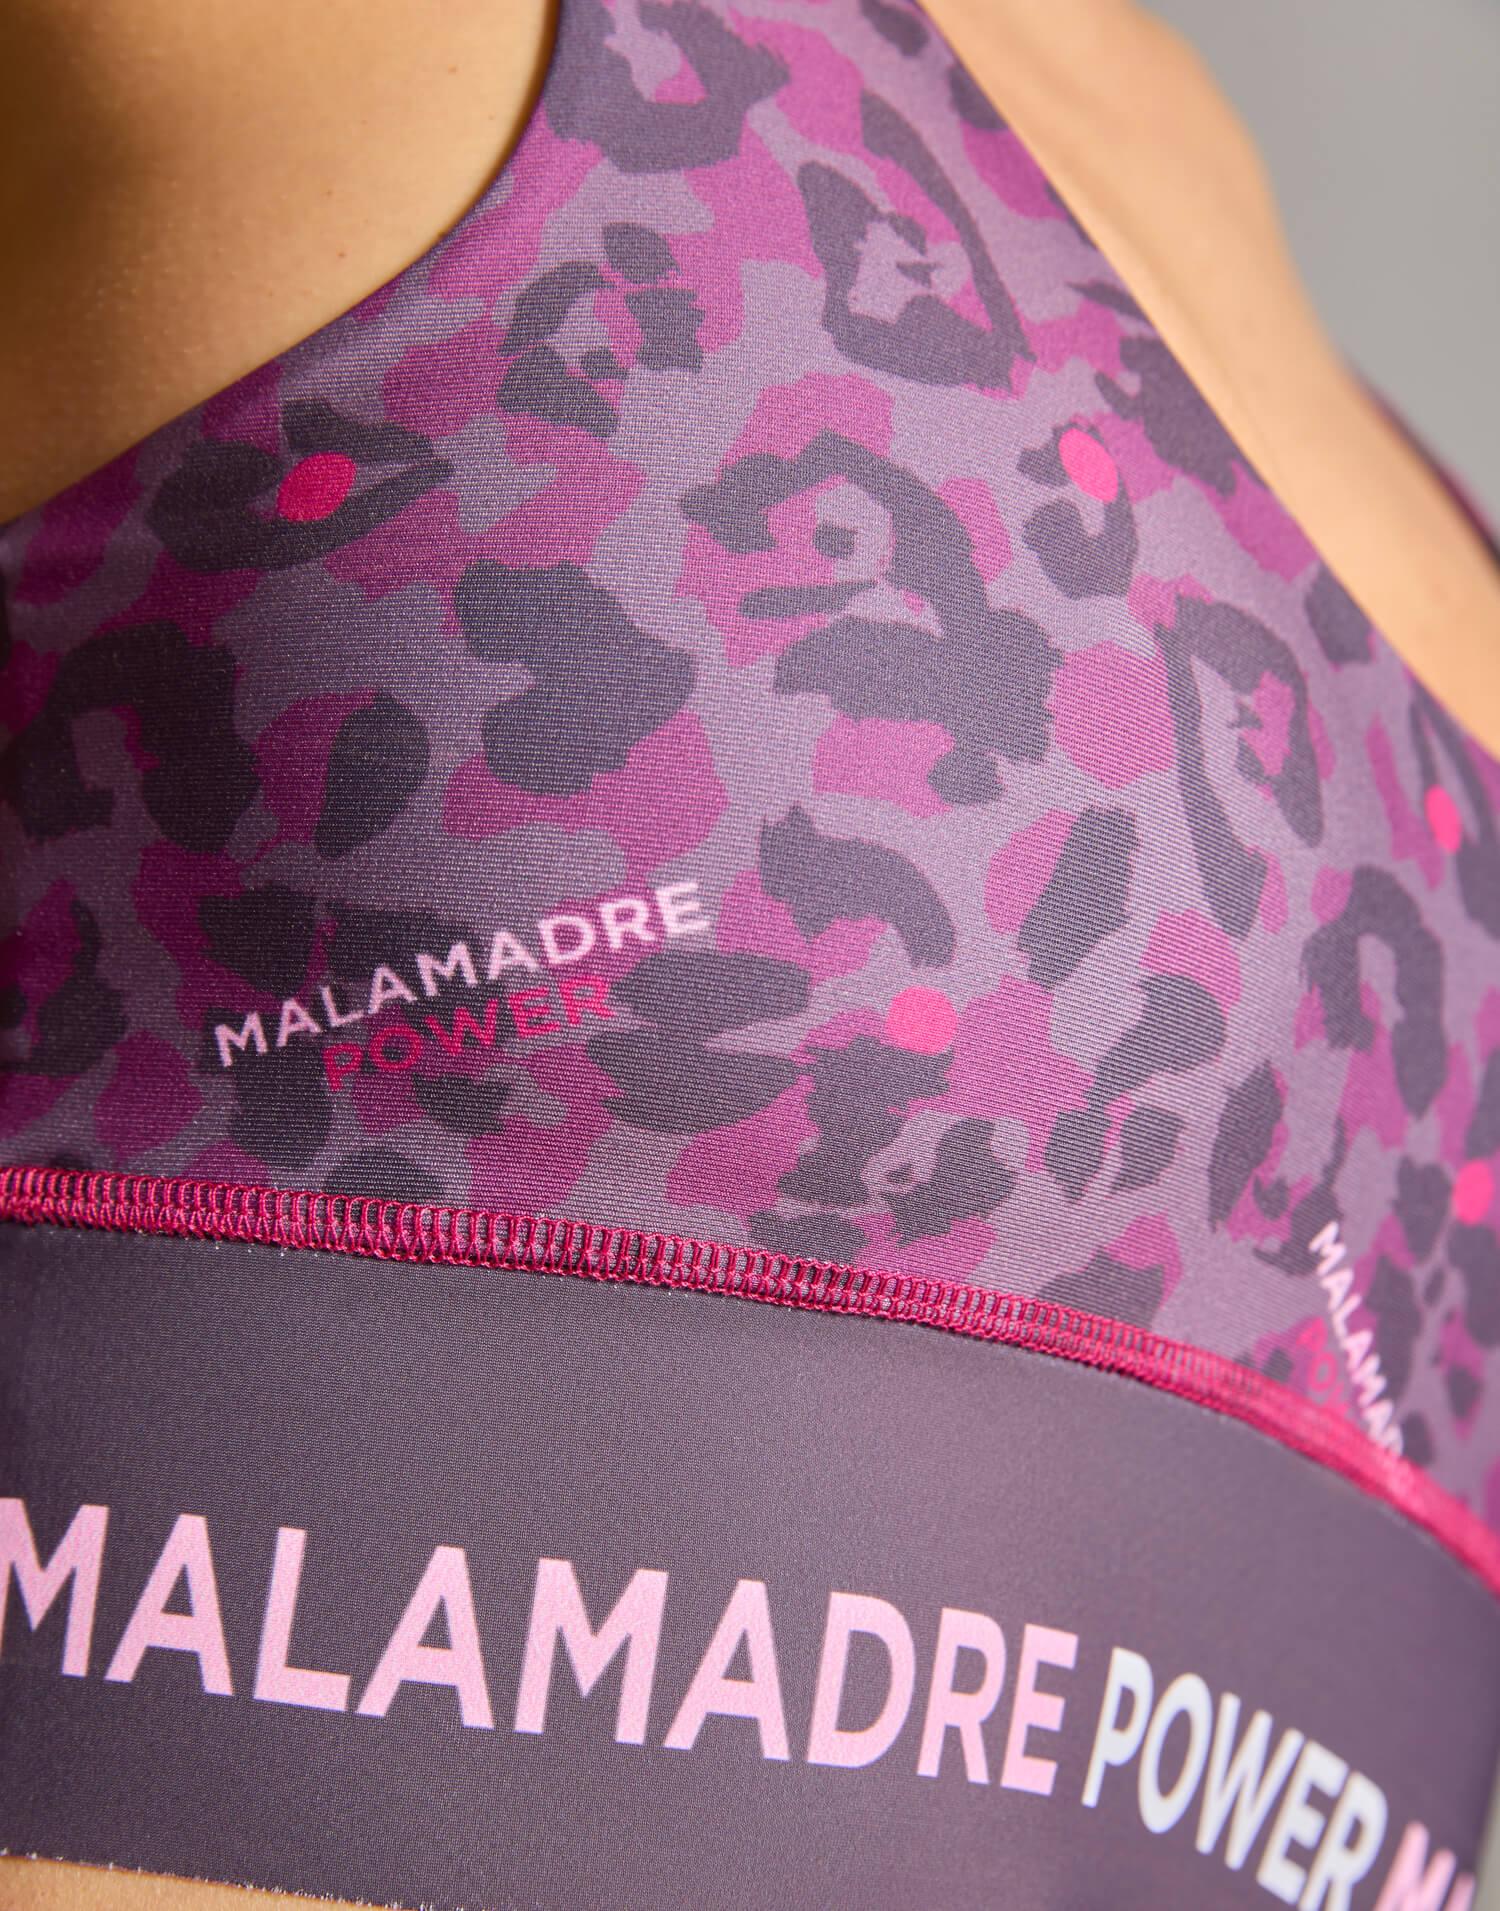 Top 'Malamadre Power'